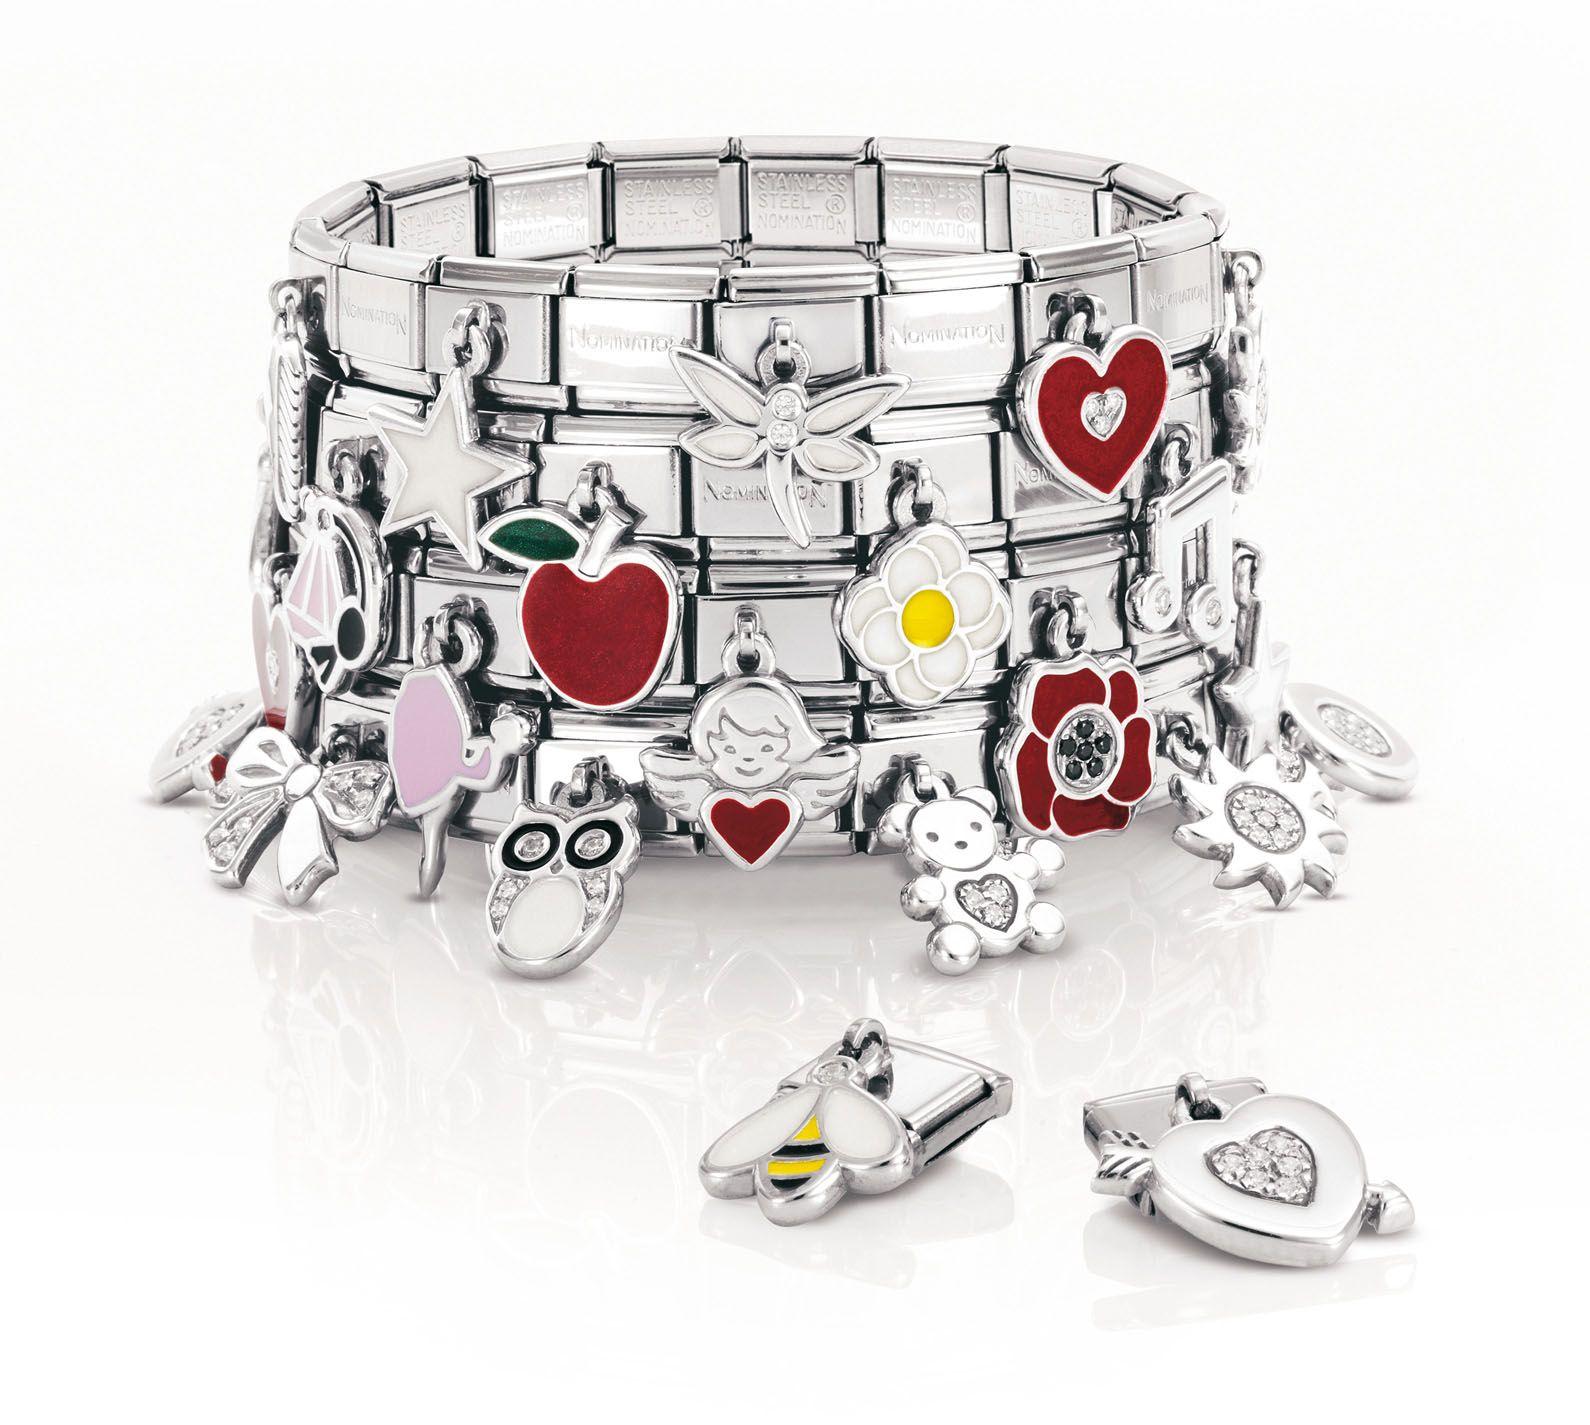 Charm Bracelets  Nomination Charm Bracelets  All You Need To Know